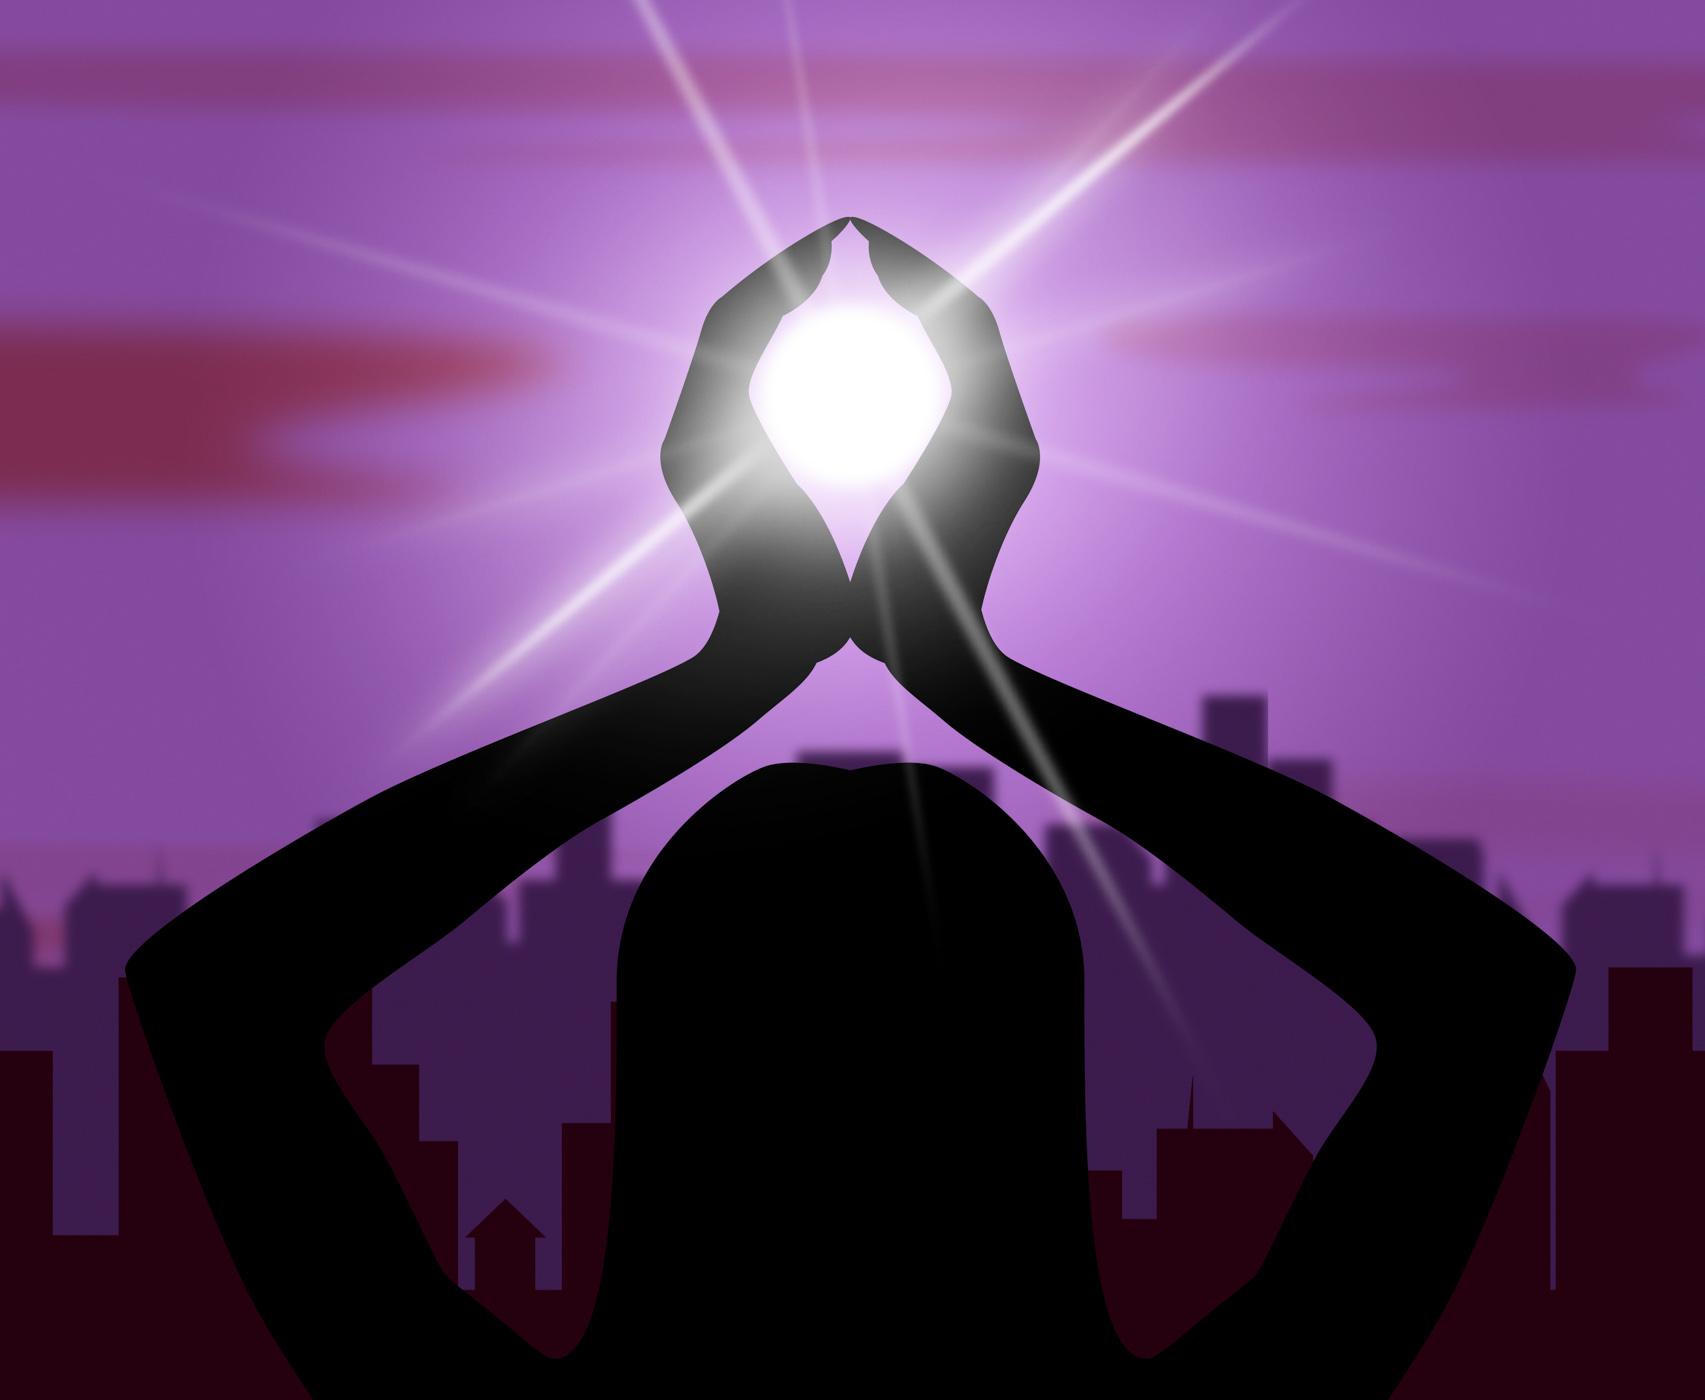 Yoga Pose Means Feeling Posture And Poses, Balance, Pose, Yogapose, Yoga, HQ Photo